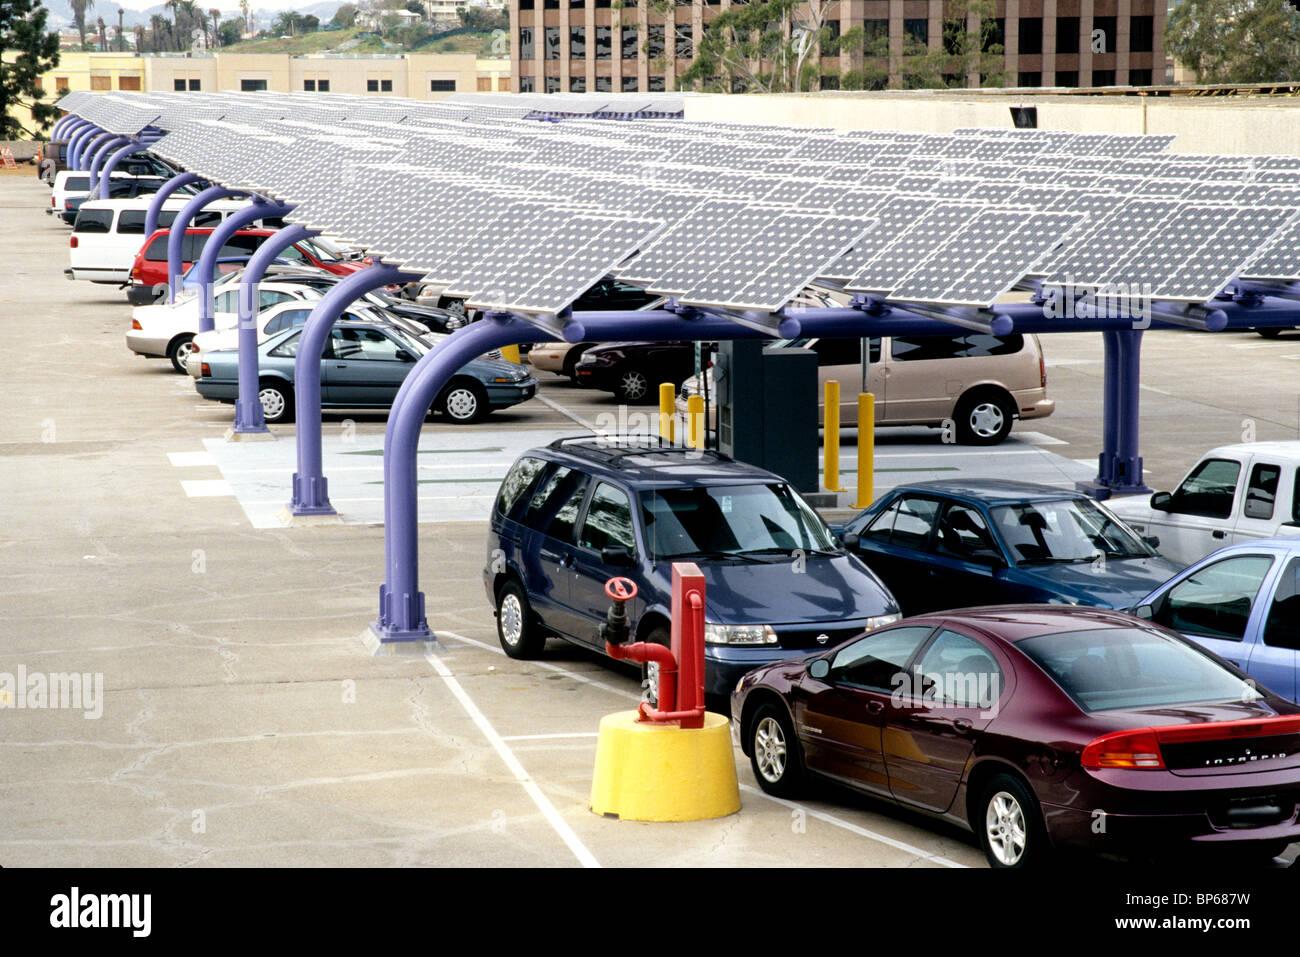 Solar Panels, parking area - Stock Image